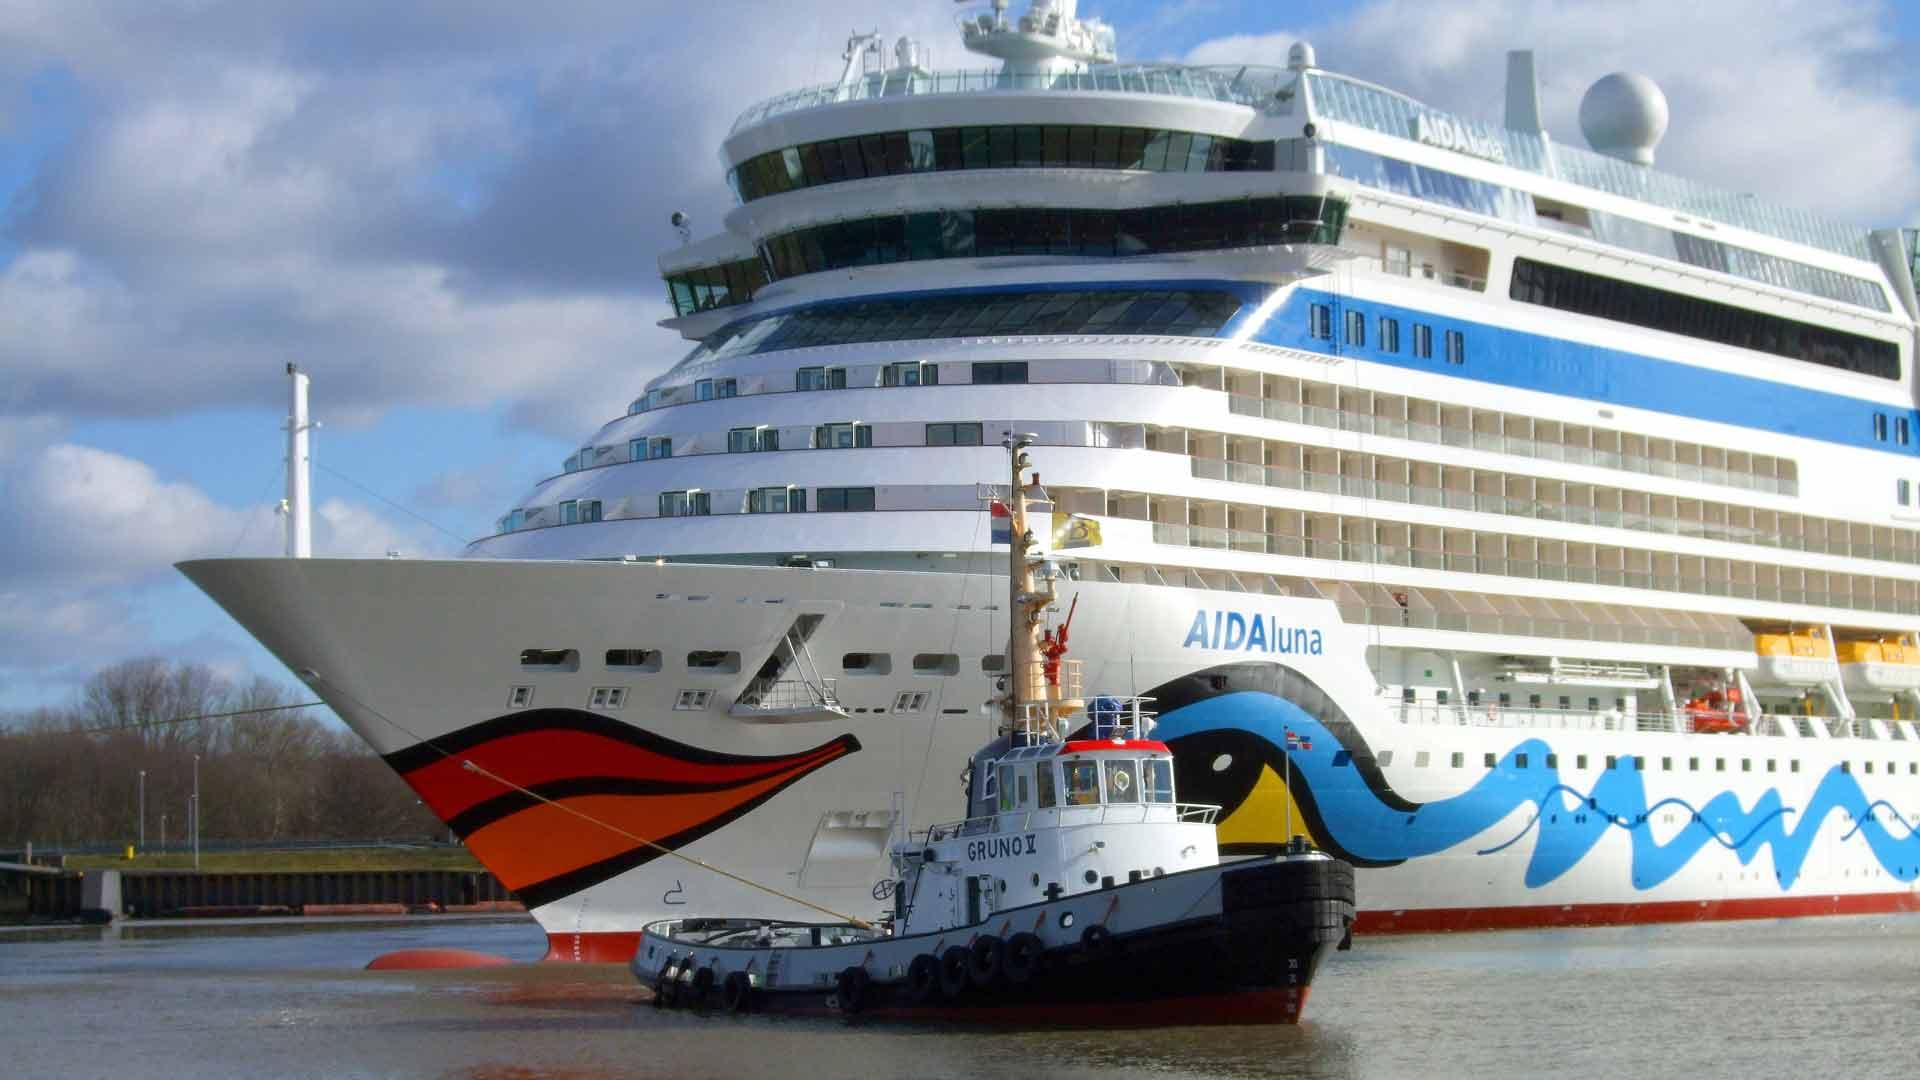 Op de Meyer Werft in Papenburg worden enorme cruiseschepen gebouwd. © Emsland Touristik GmbH